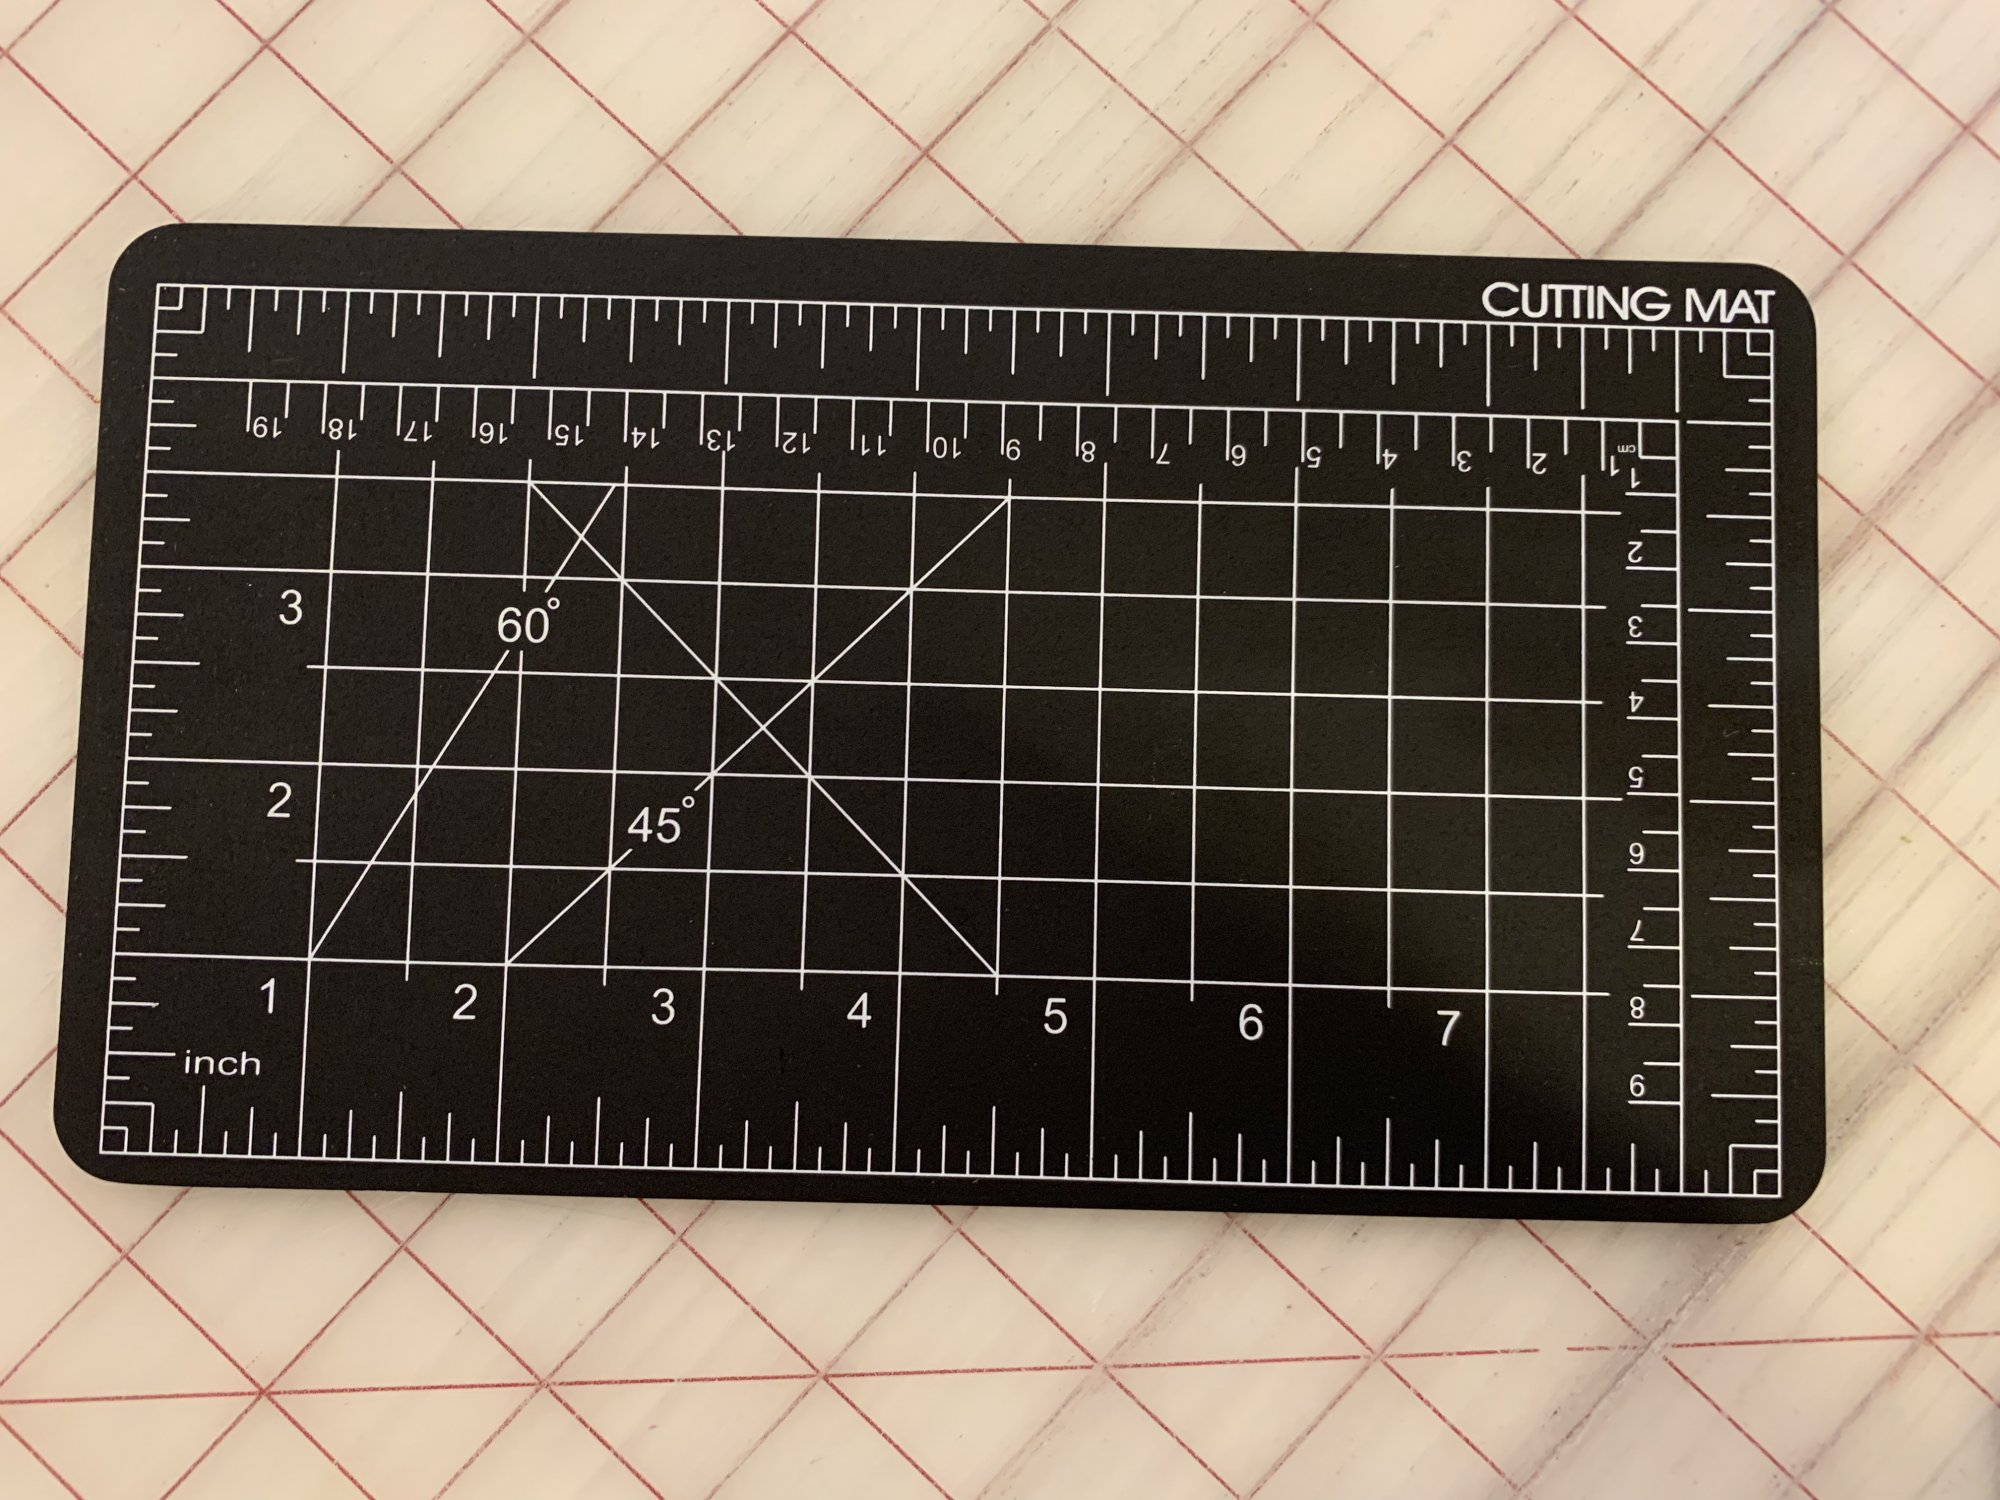 Mini Cutting Mat 5 x 9